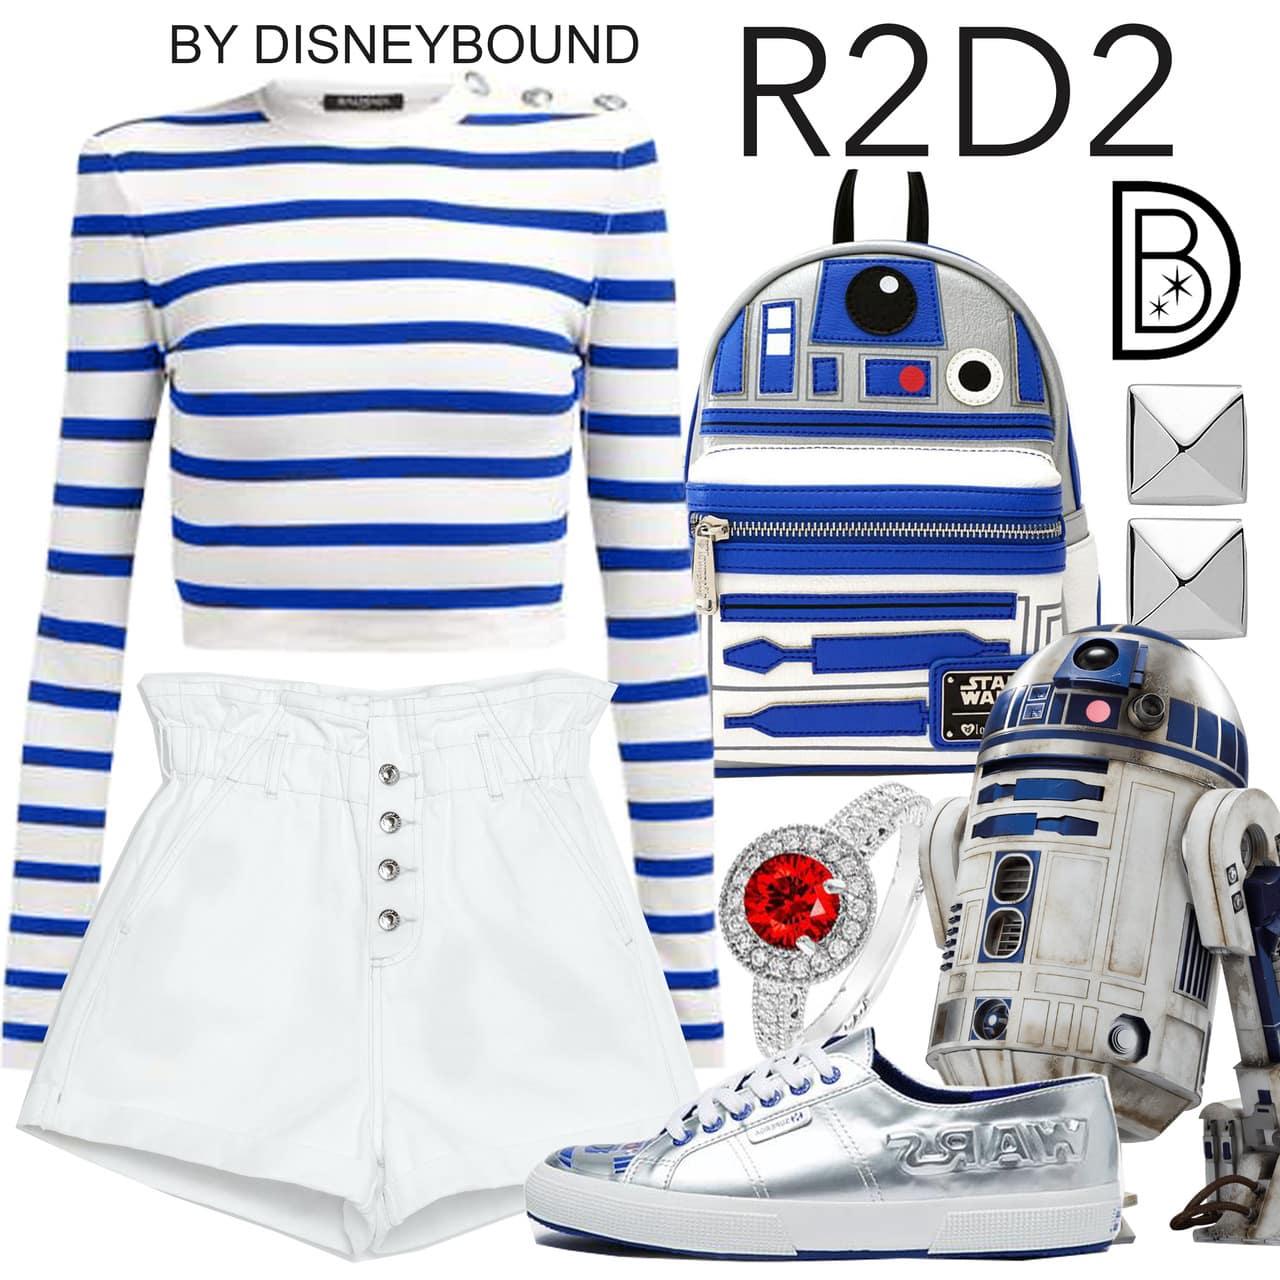 R2D2 Star Wars Pyrkon Disneybound